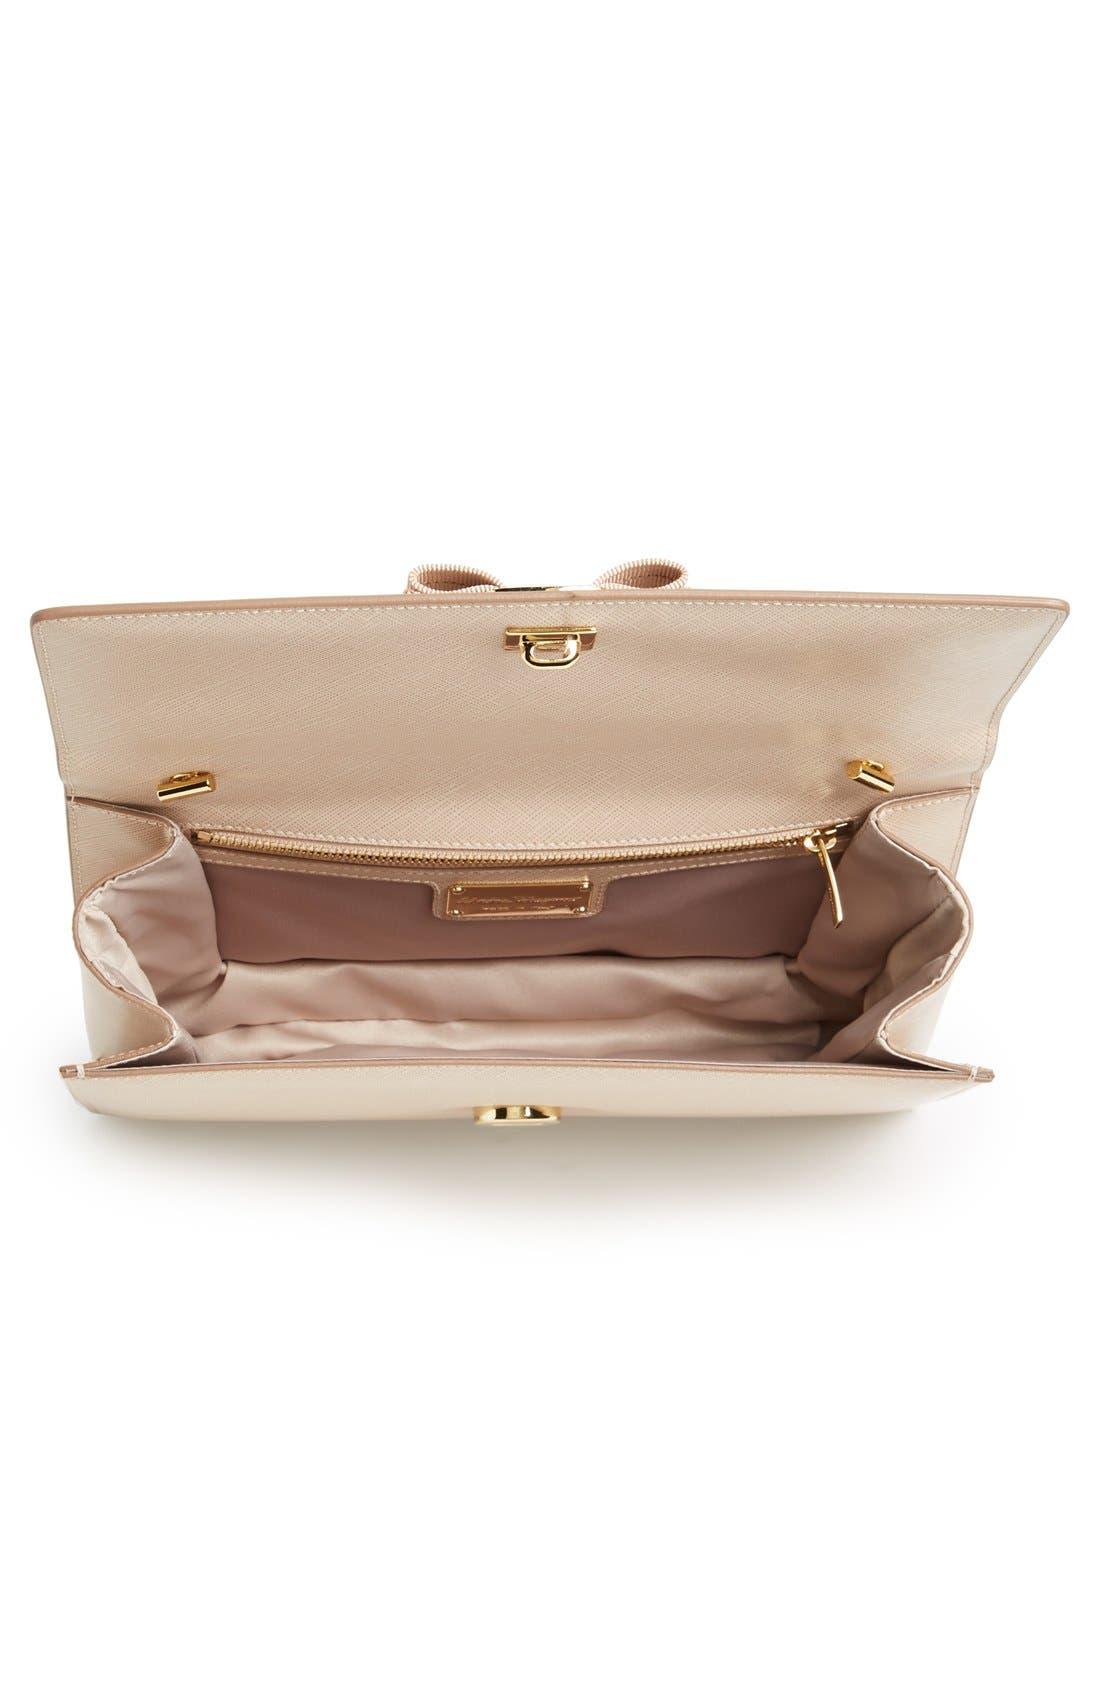 Saffiano Leather Shoulder Bag,                             Alternate thumbnail 3, color,                             250